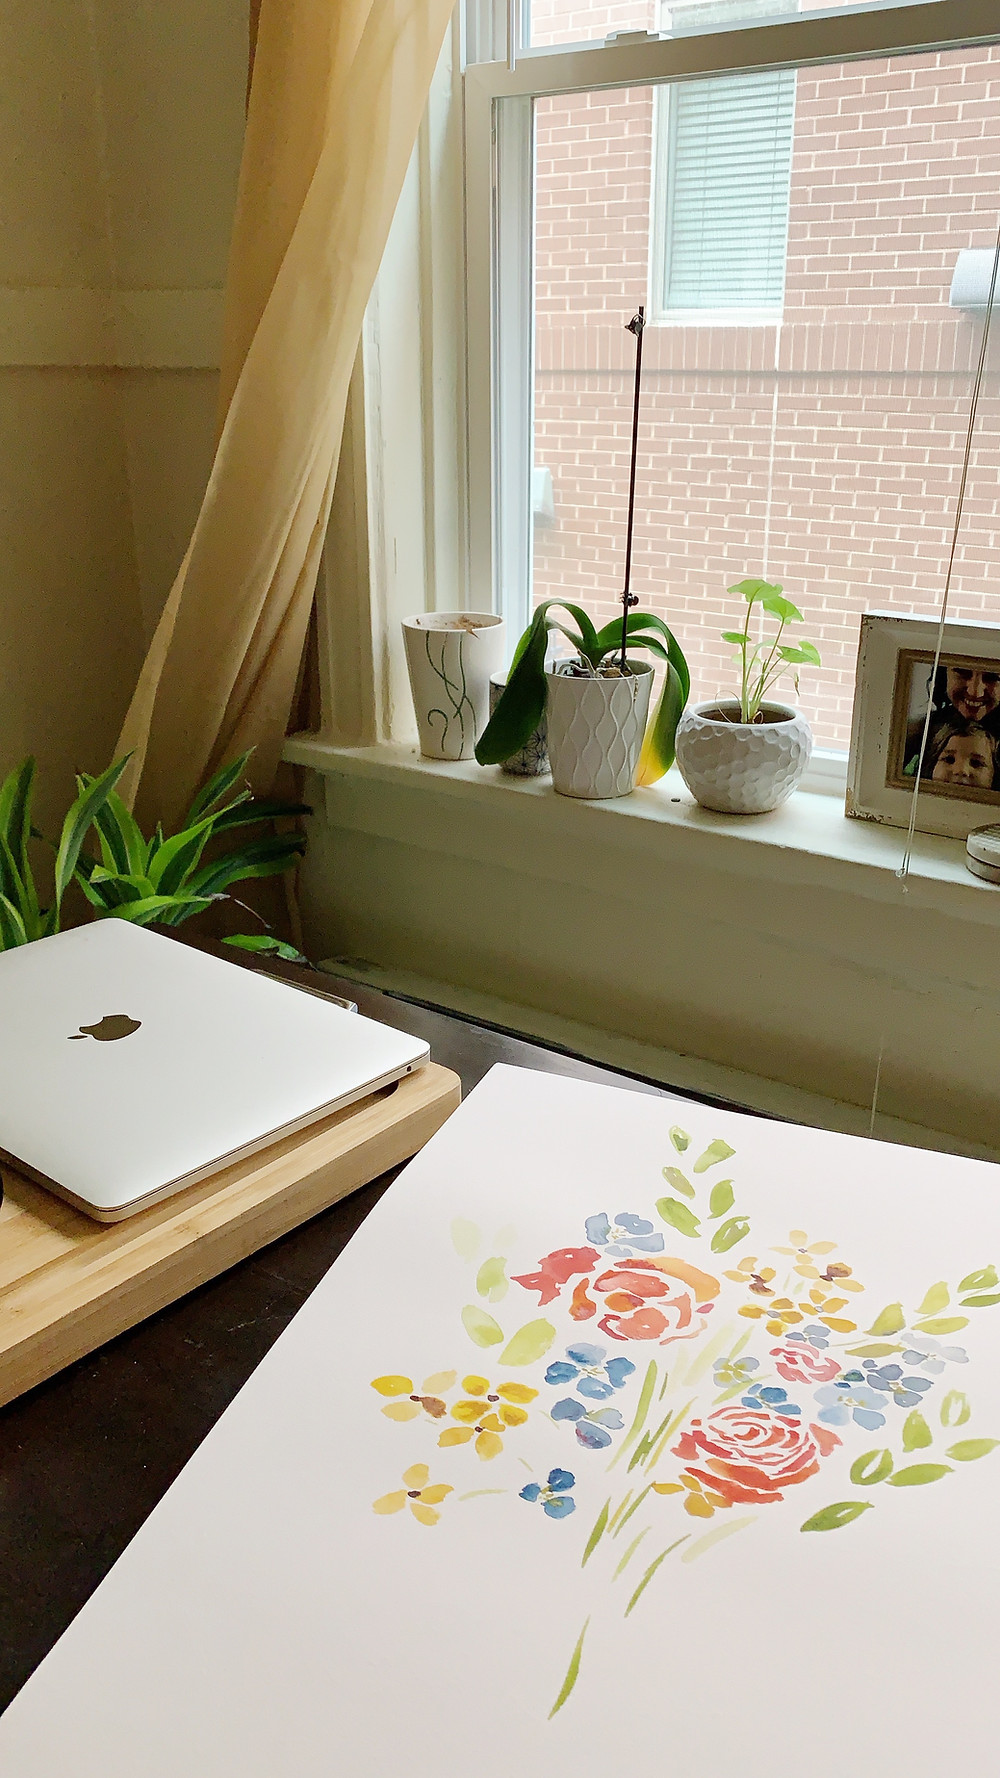 Sarah Hensley Art: St. Louis artist's Watercolor artwork of plants and flowers